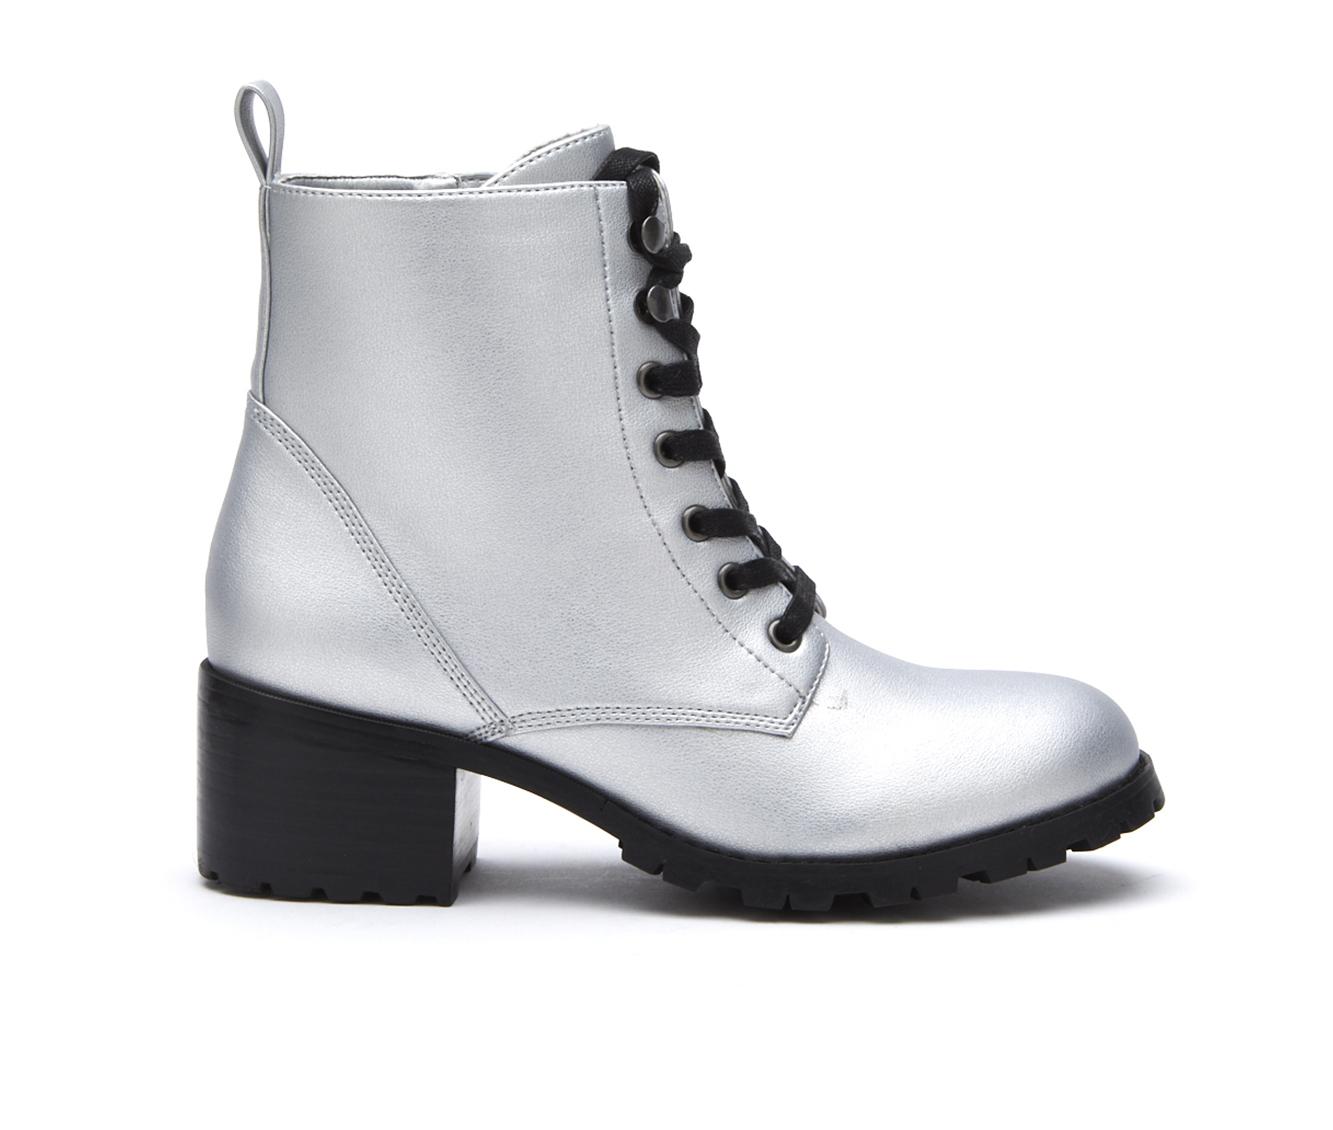 Coconuts Glacier Women's Boot (Silver Faux Leather)